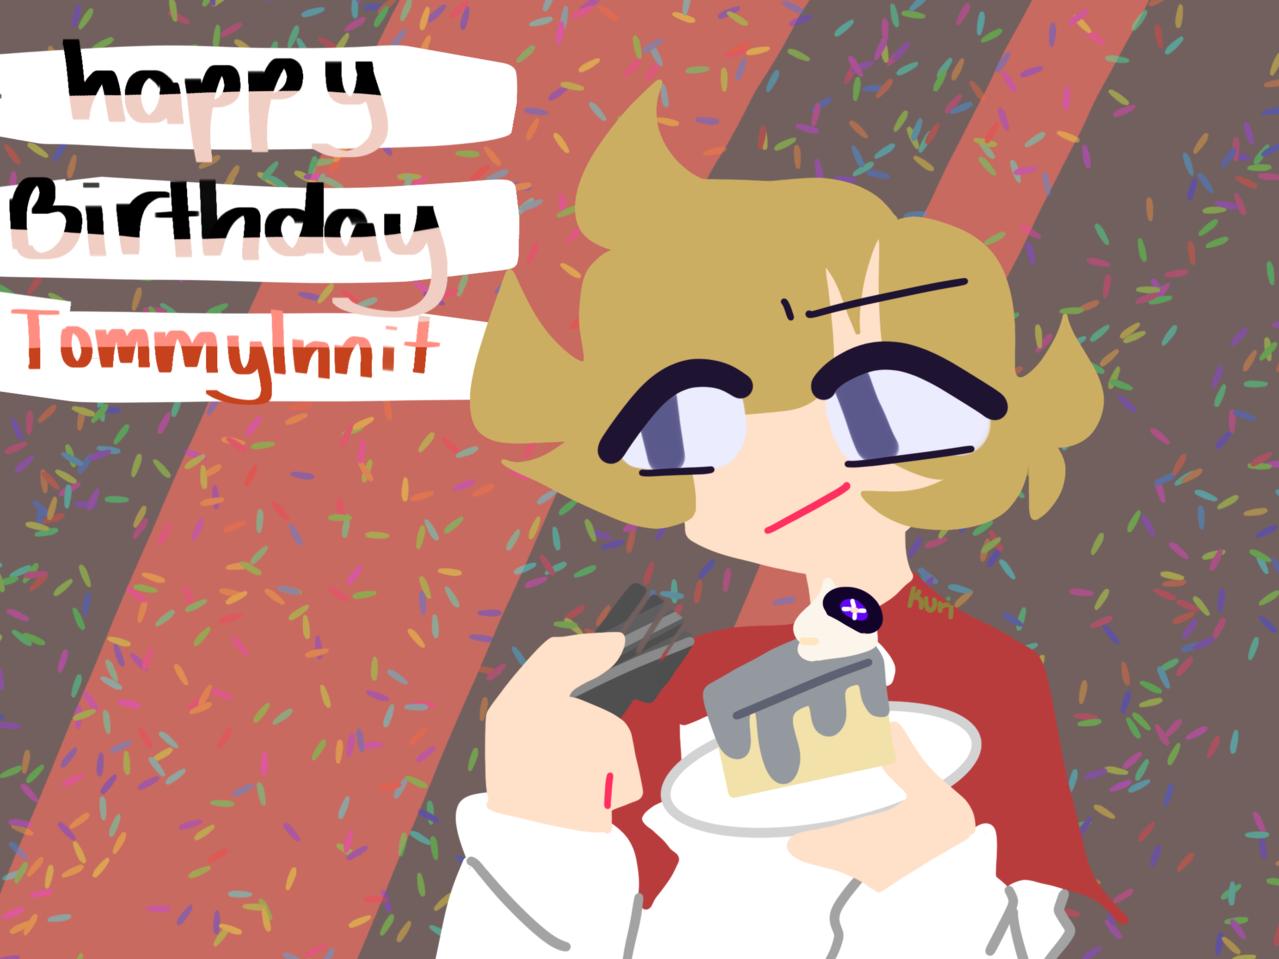 HAPPY BIRTHDAY TOMMYINNIT  Illust of DreamiiKuri | Drèam mode©️ gift drawing lineless